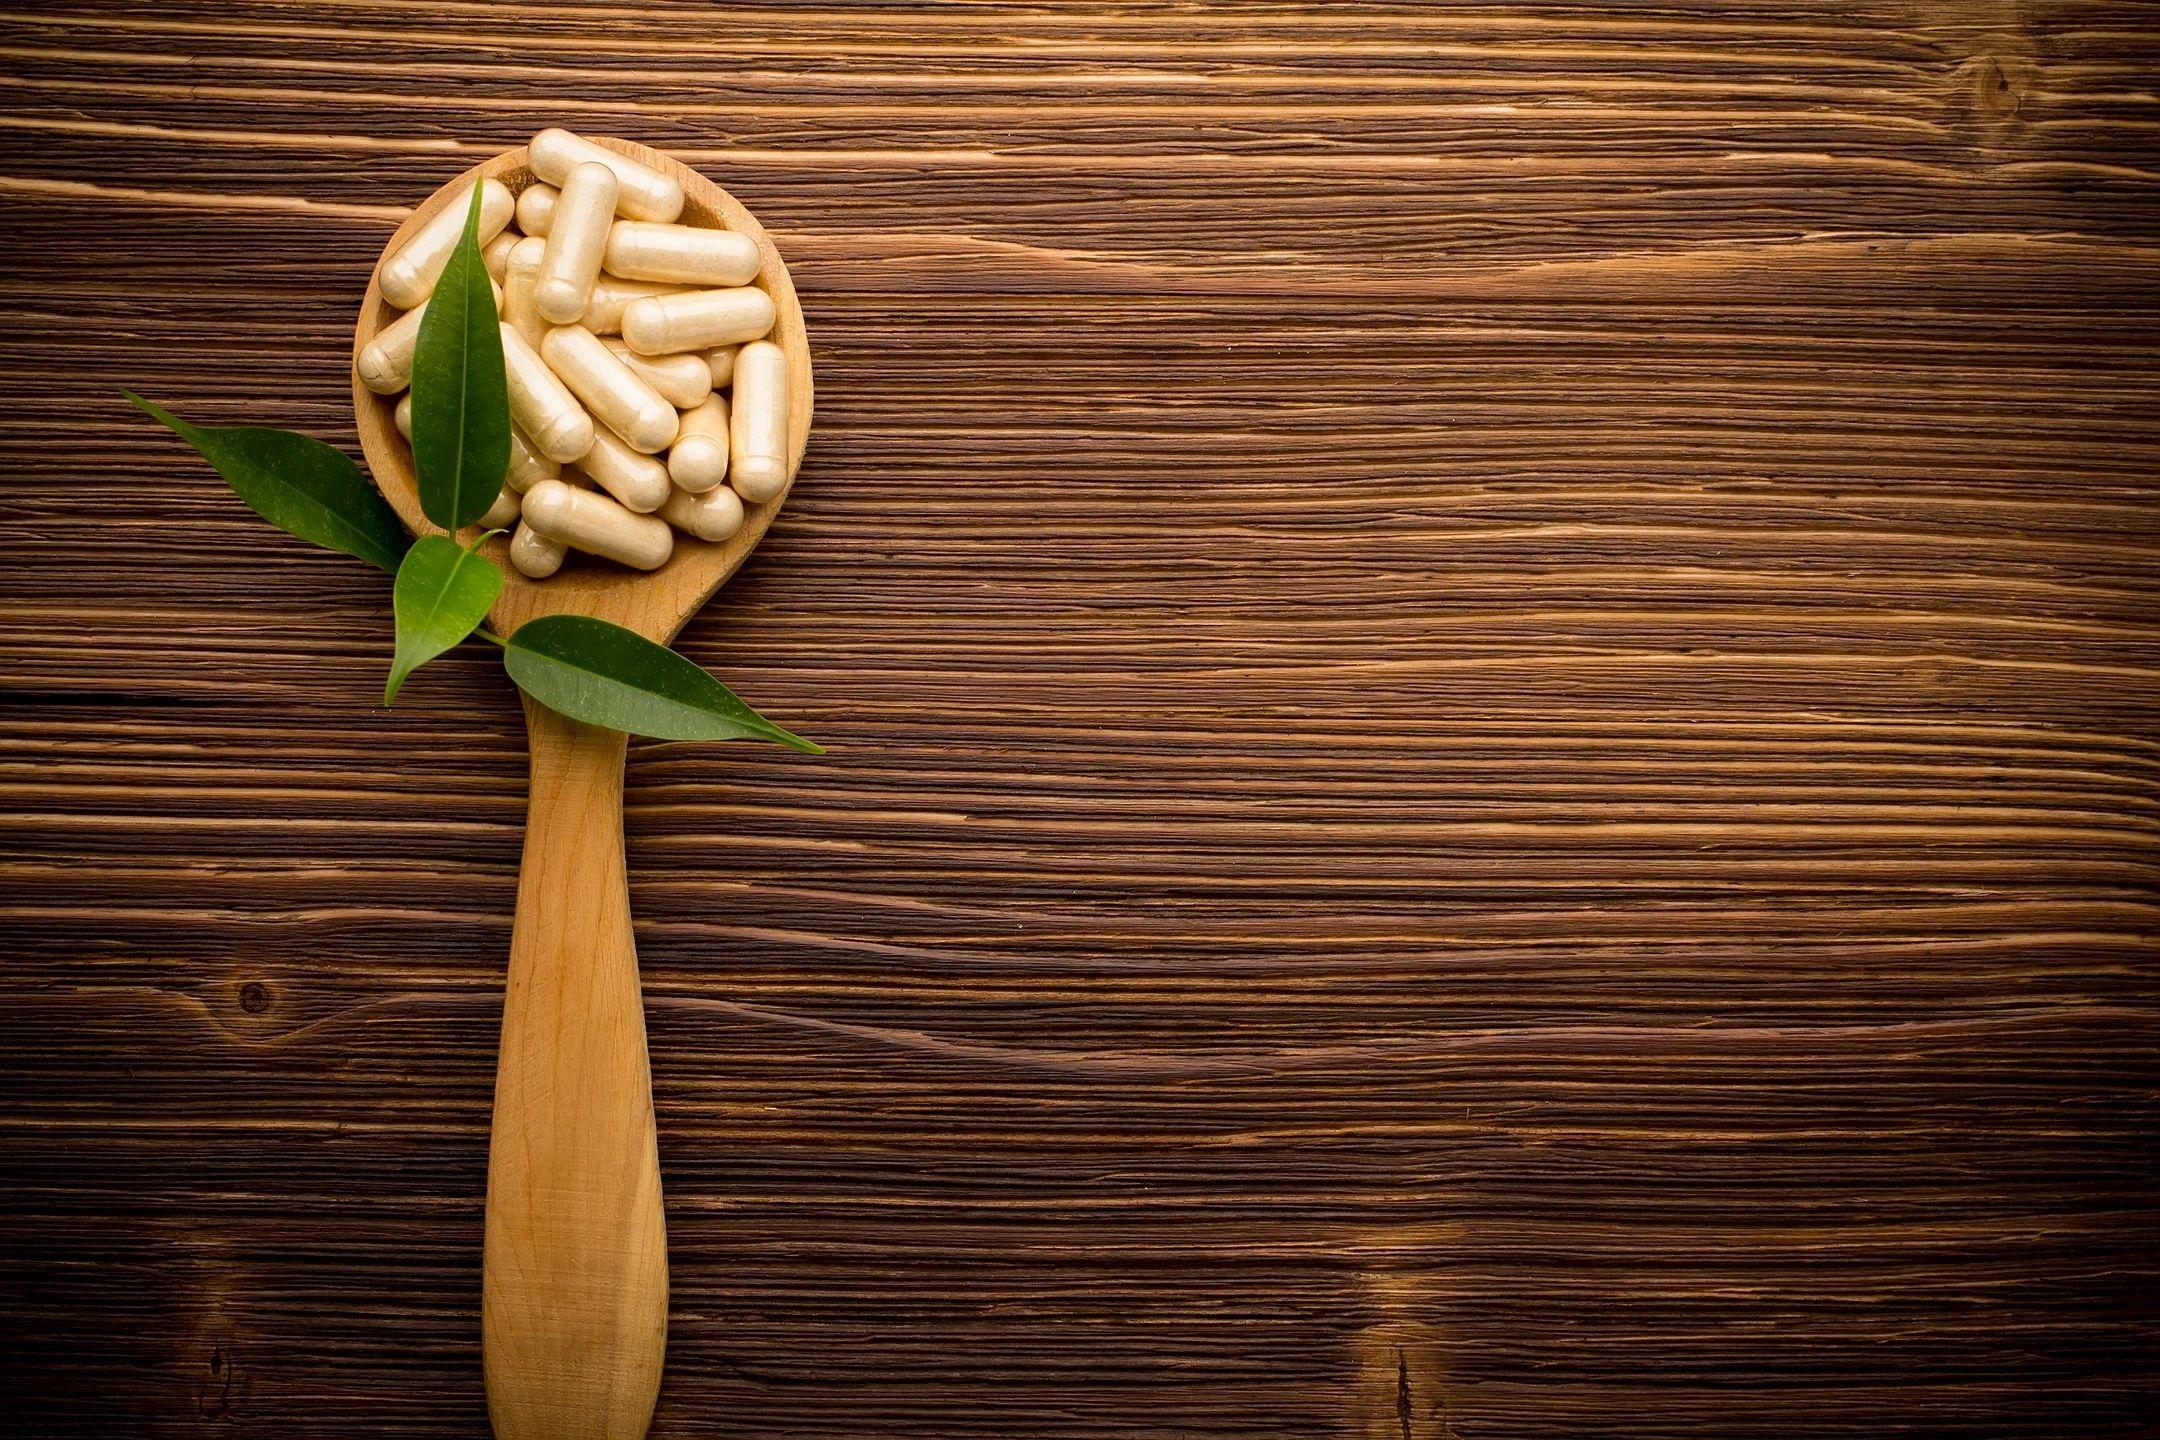 supplements, herbs, vitamins, minerals, natural treatments, naturopathic doctor, edina, woodbury, mn